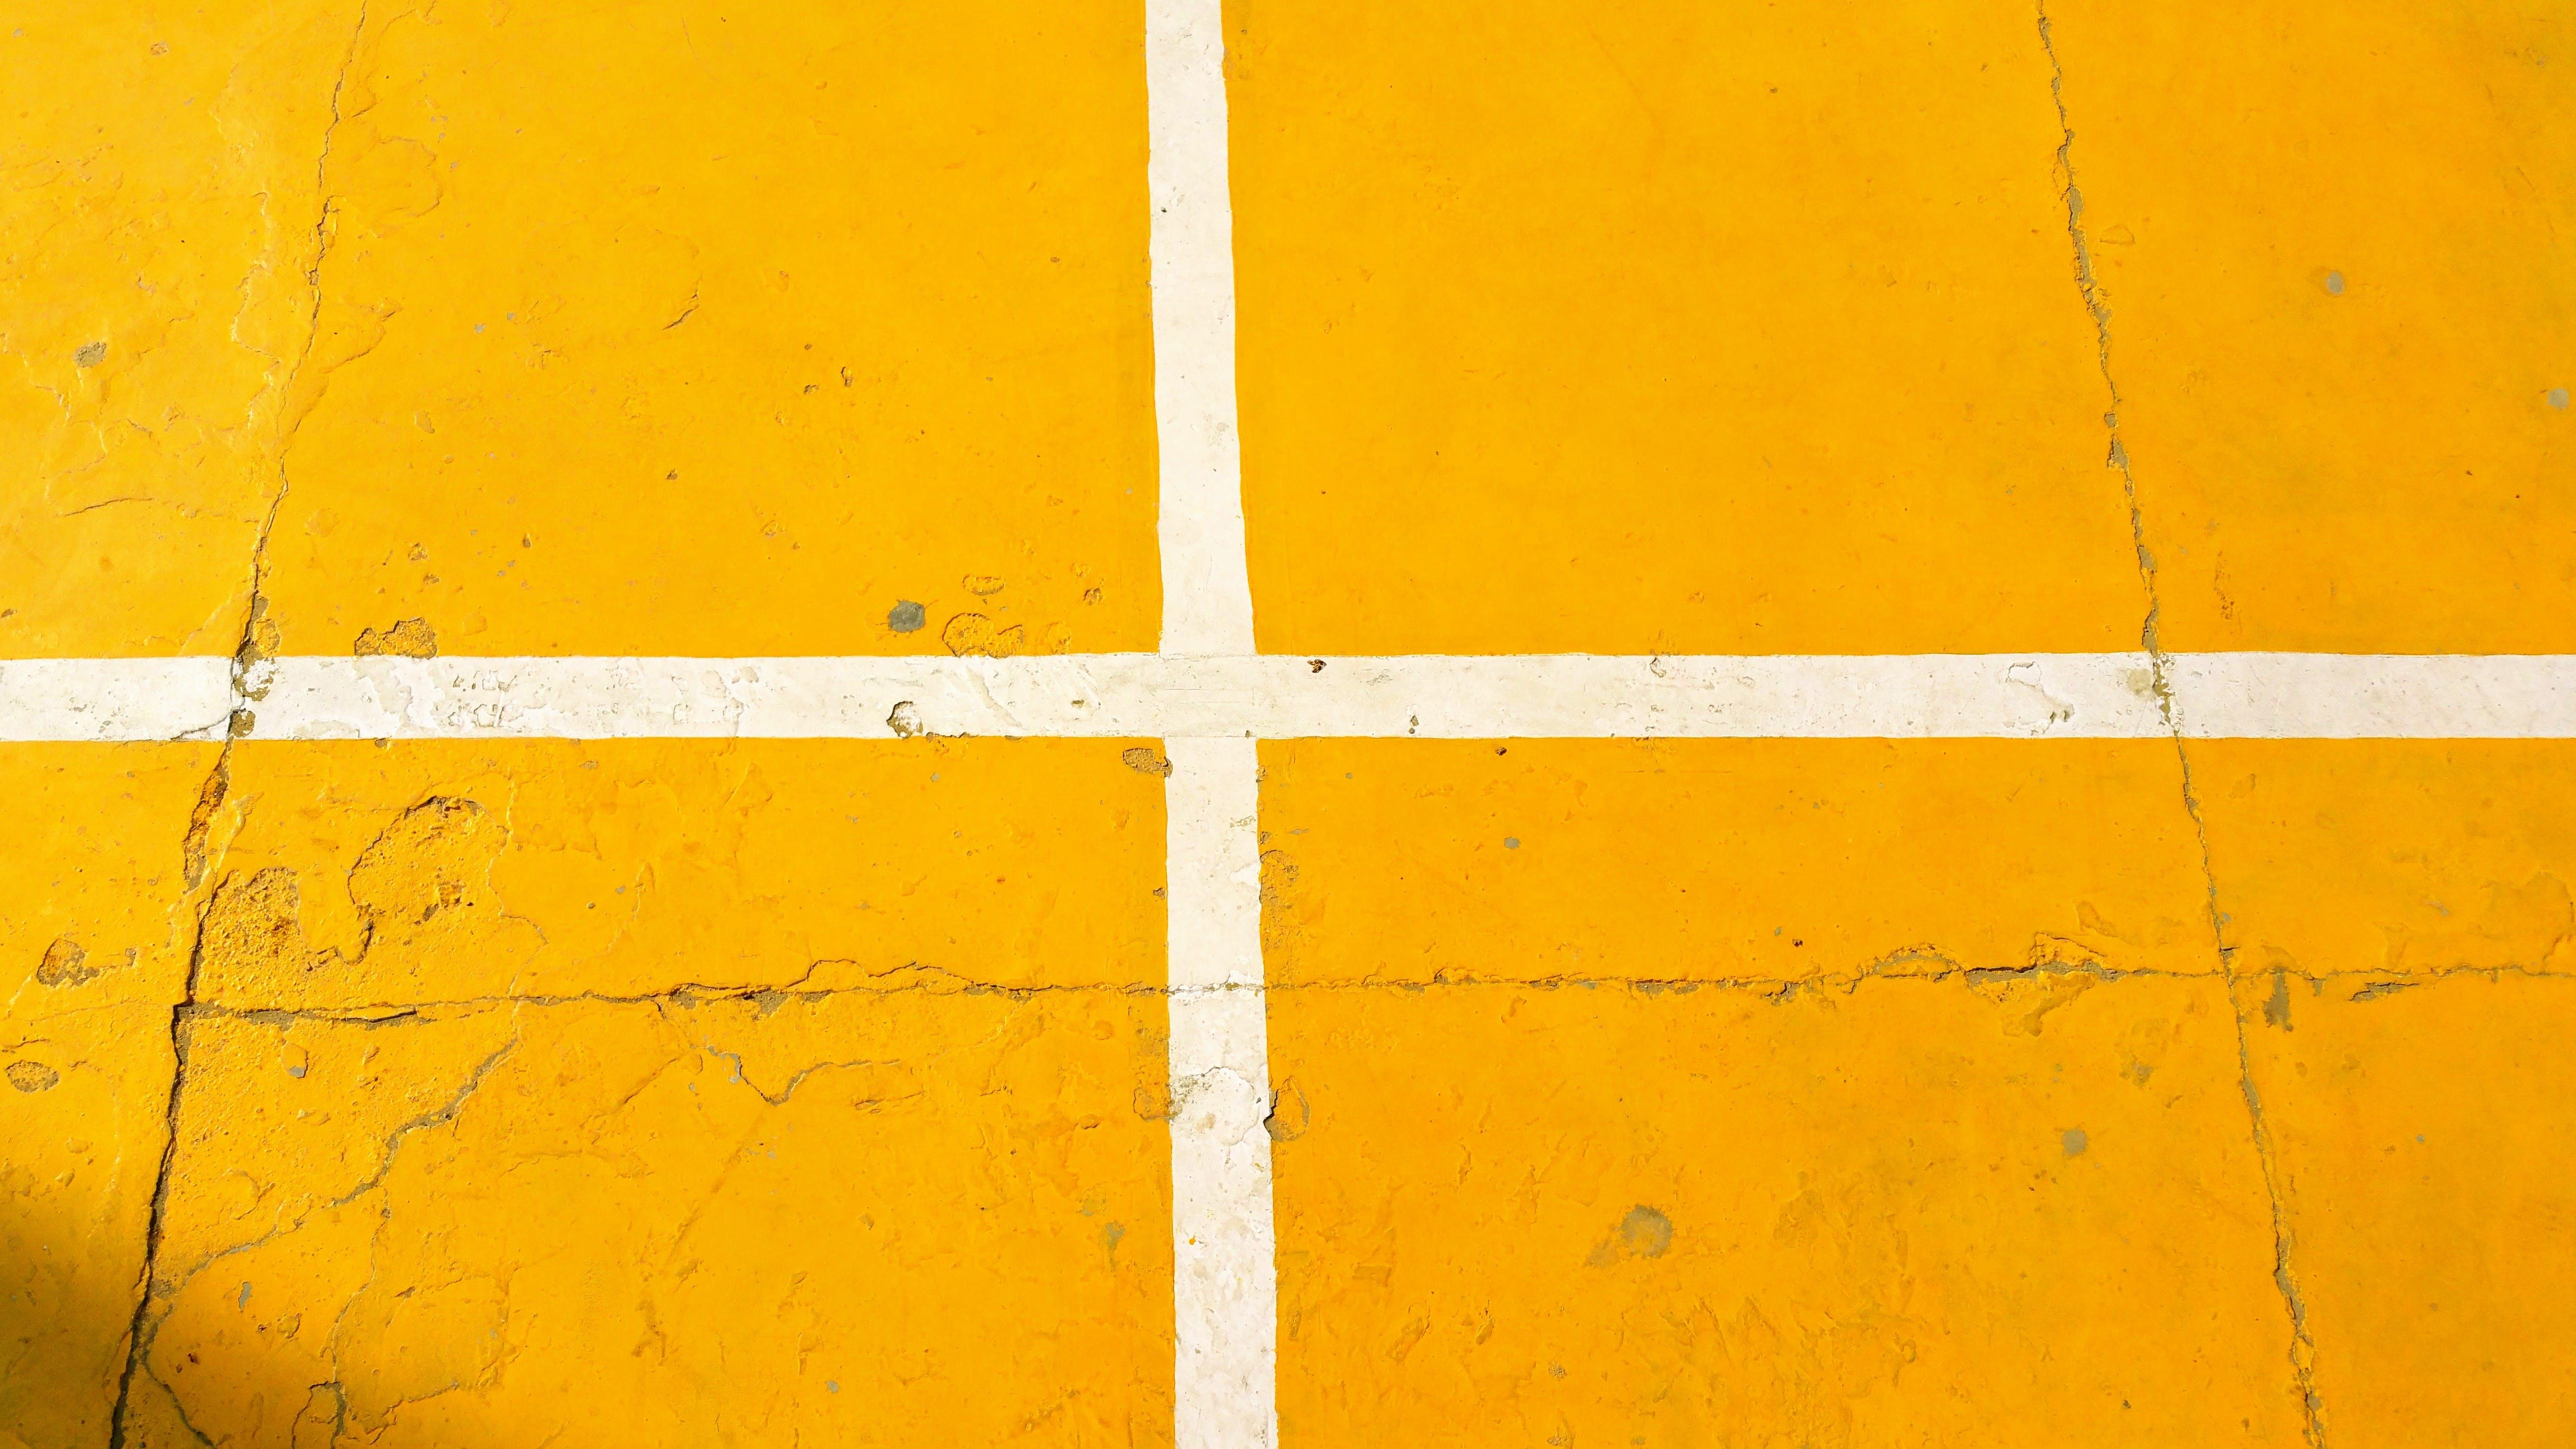 Free stock photo of yellow, game, basketball, court